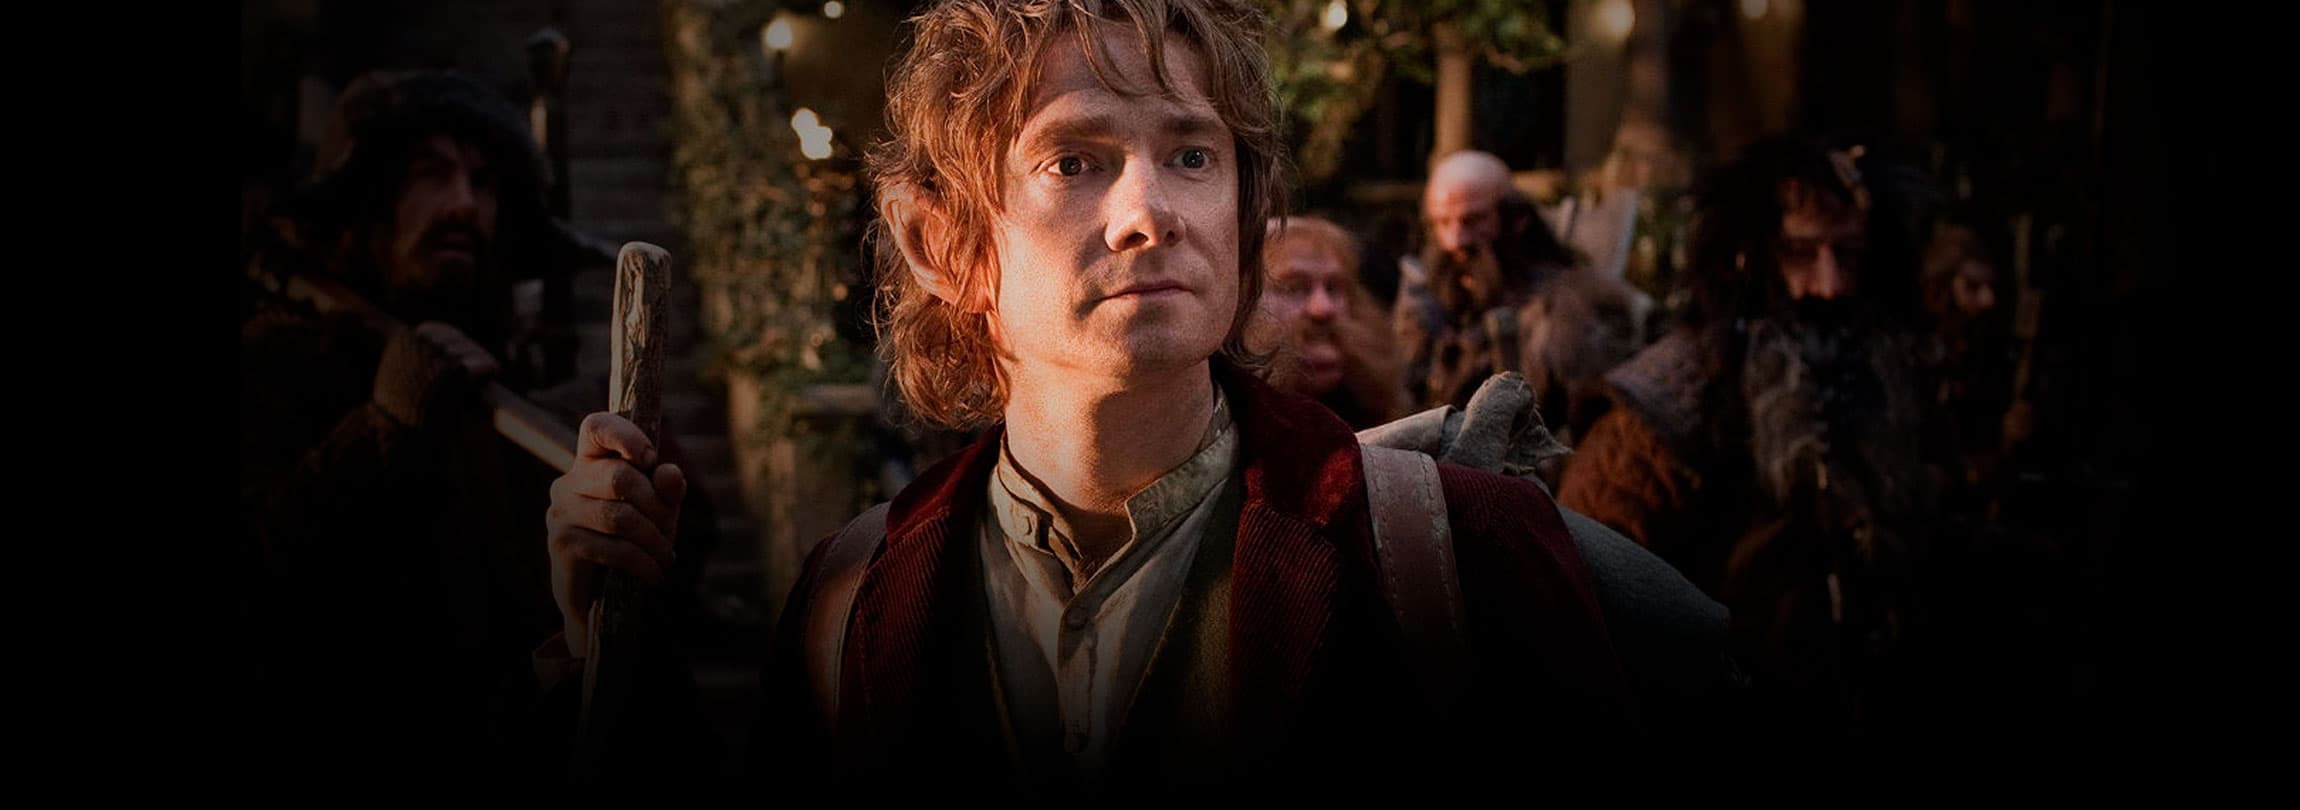 O que os hobbits têm a ensinar-nos